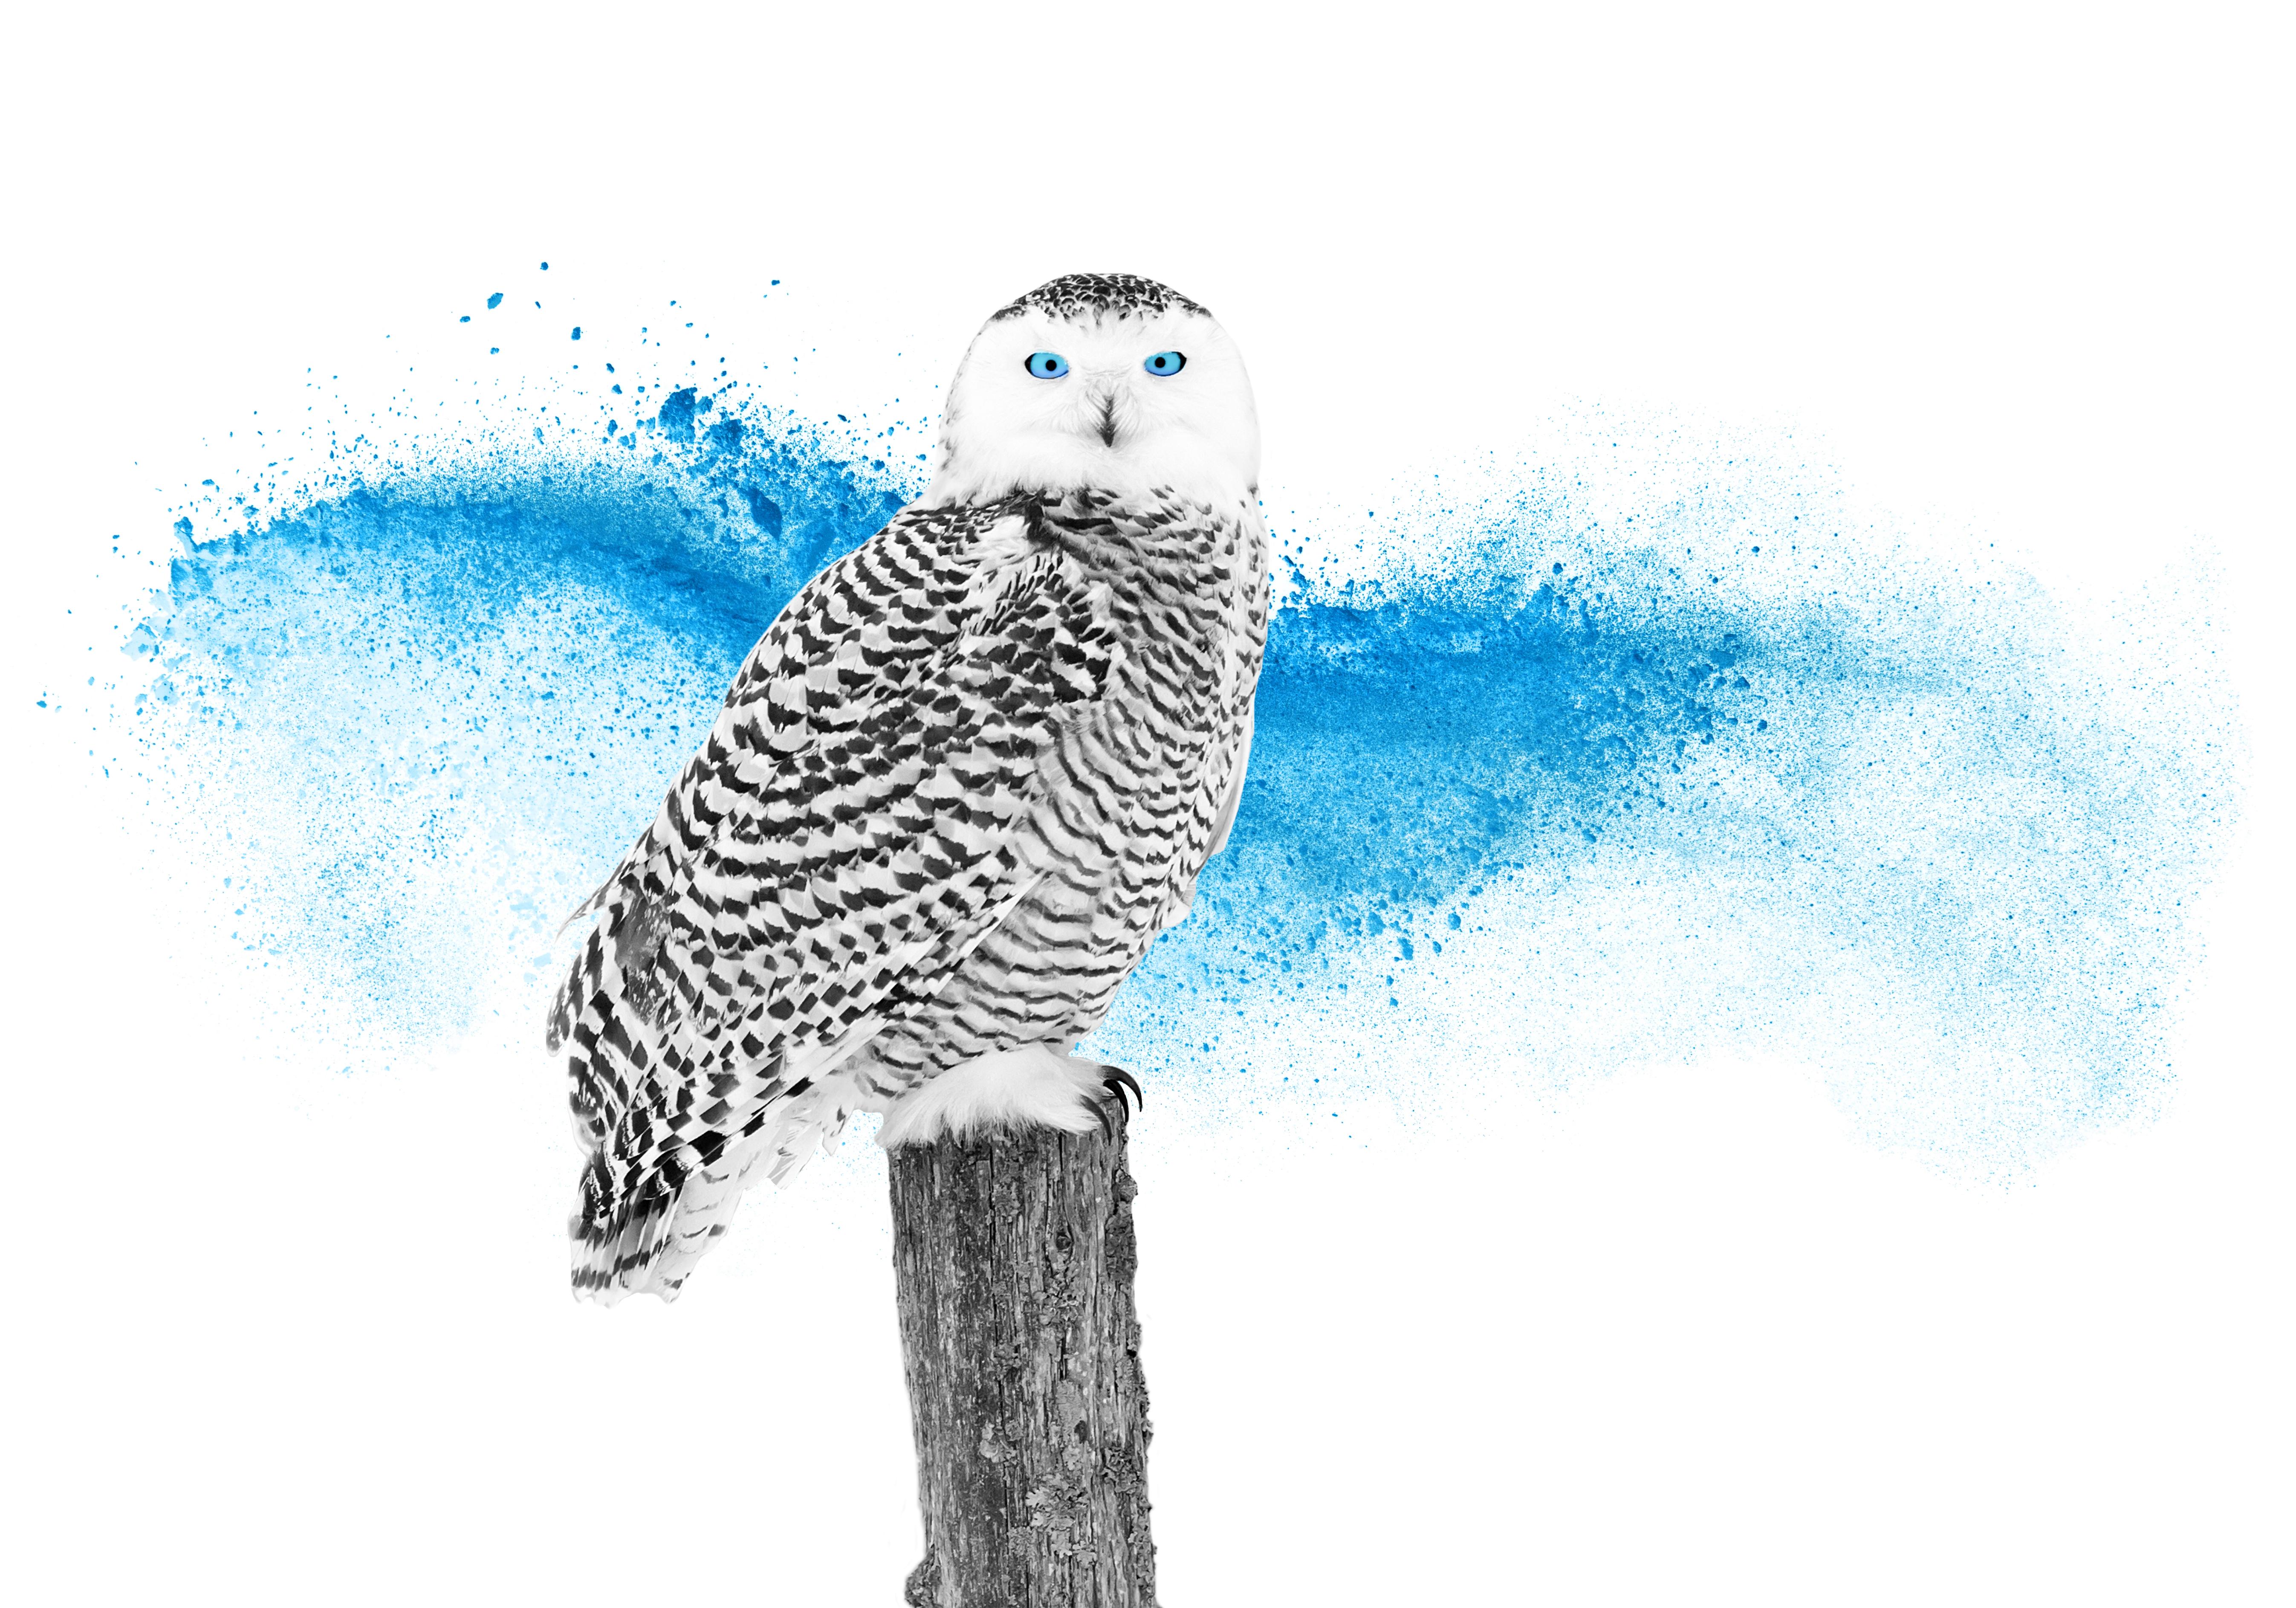 Owl_on_post_NoT-1